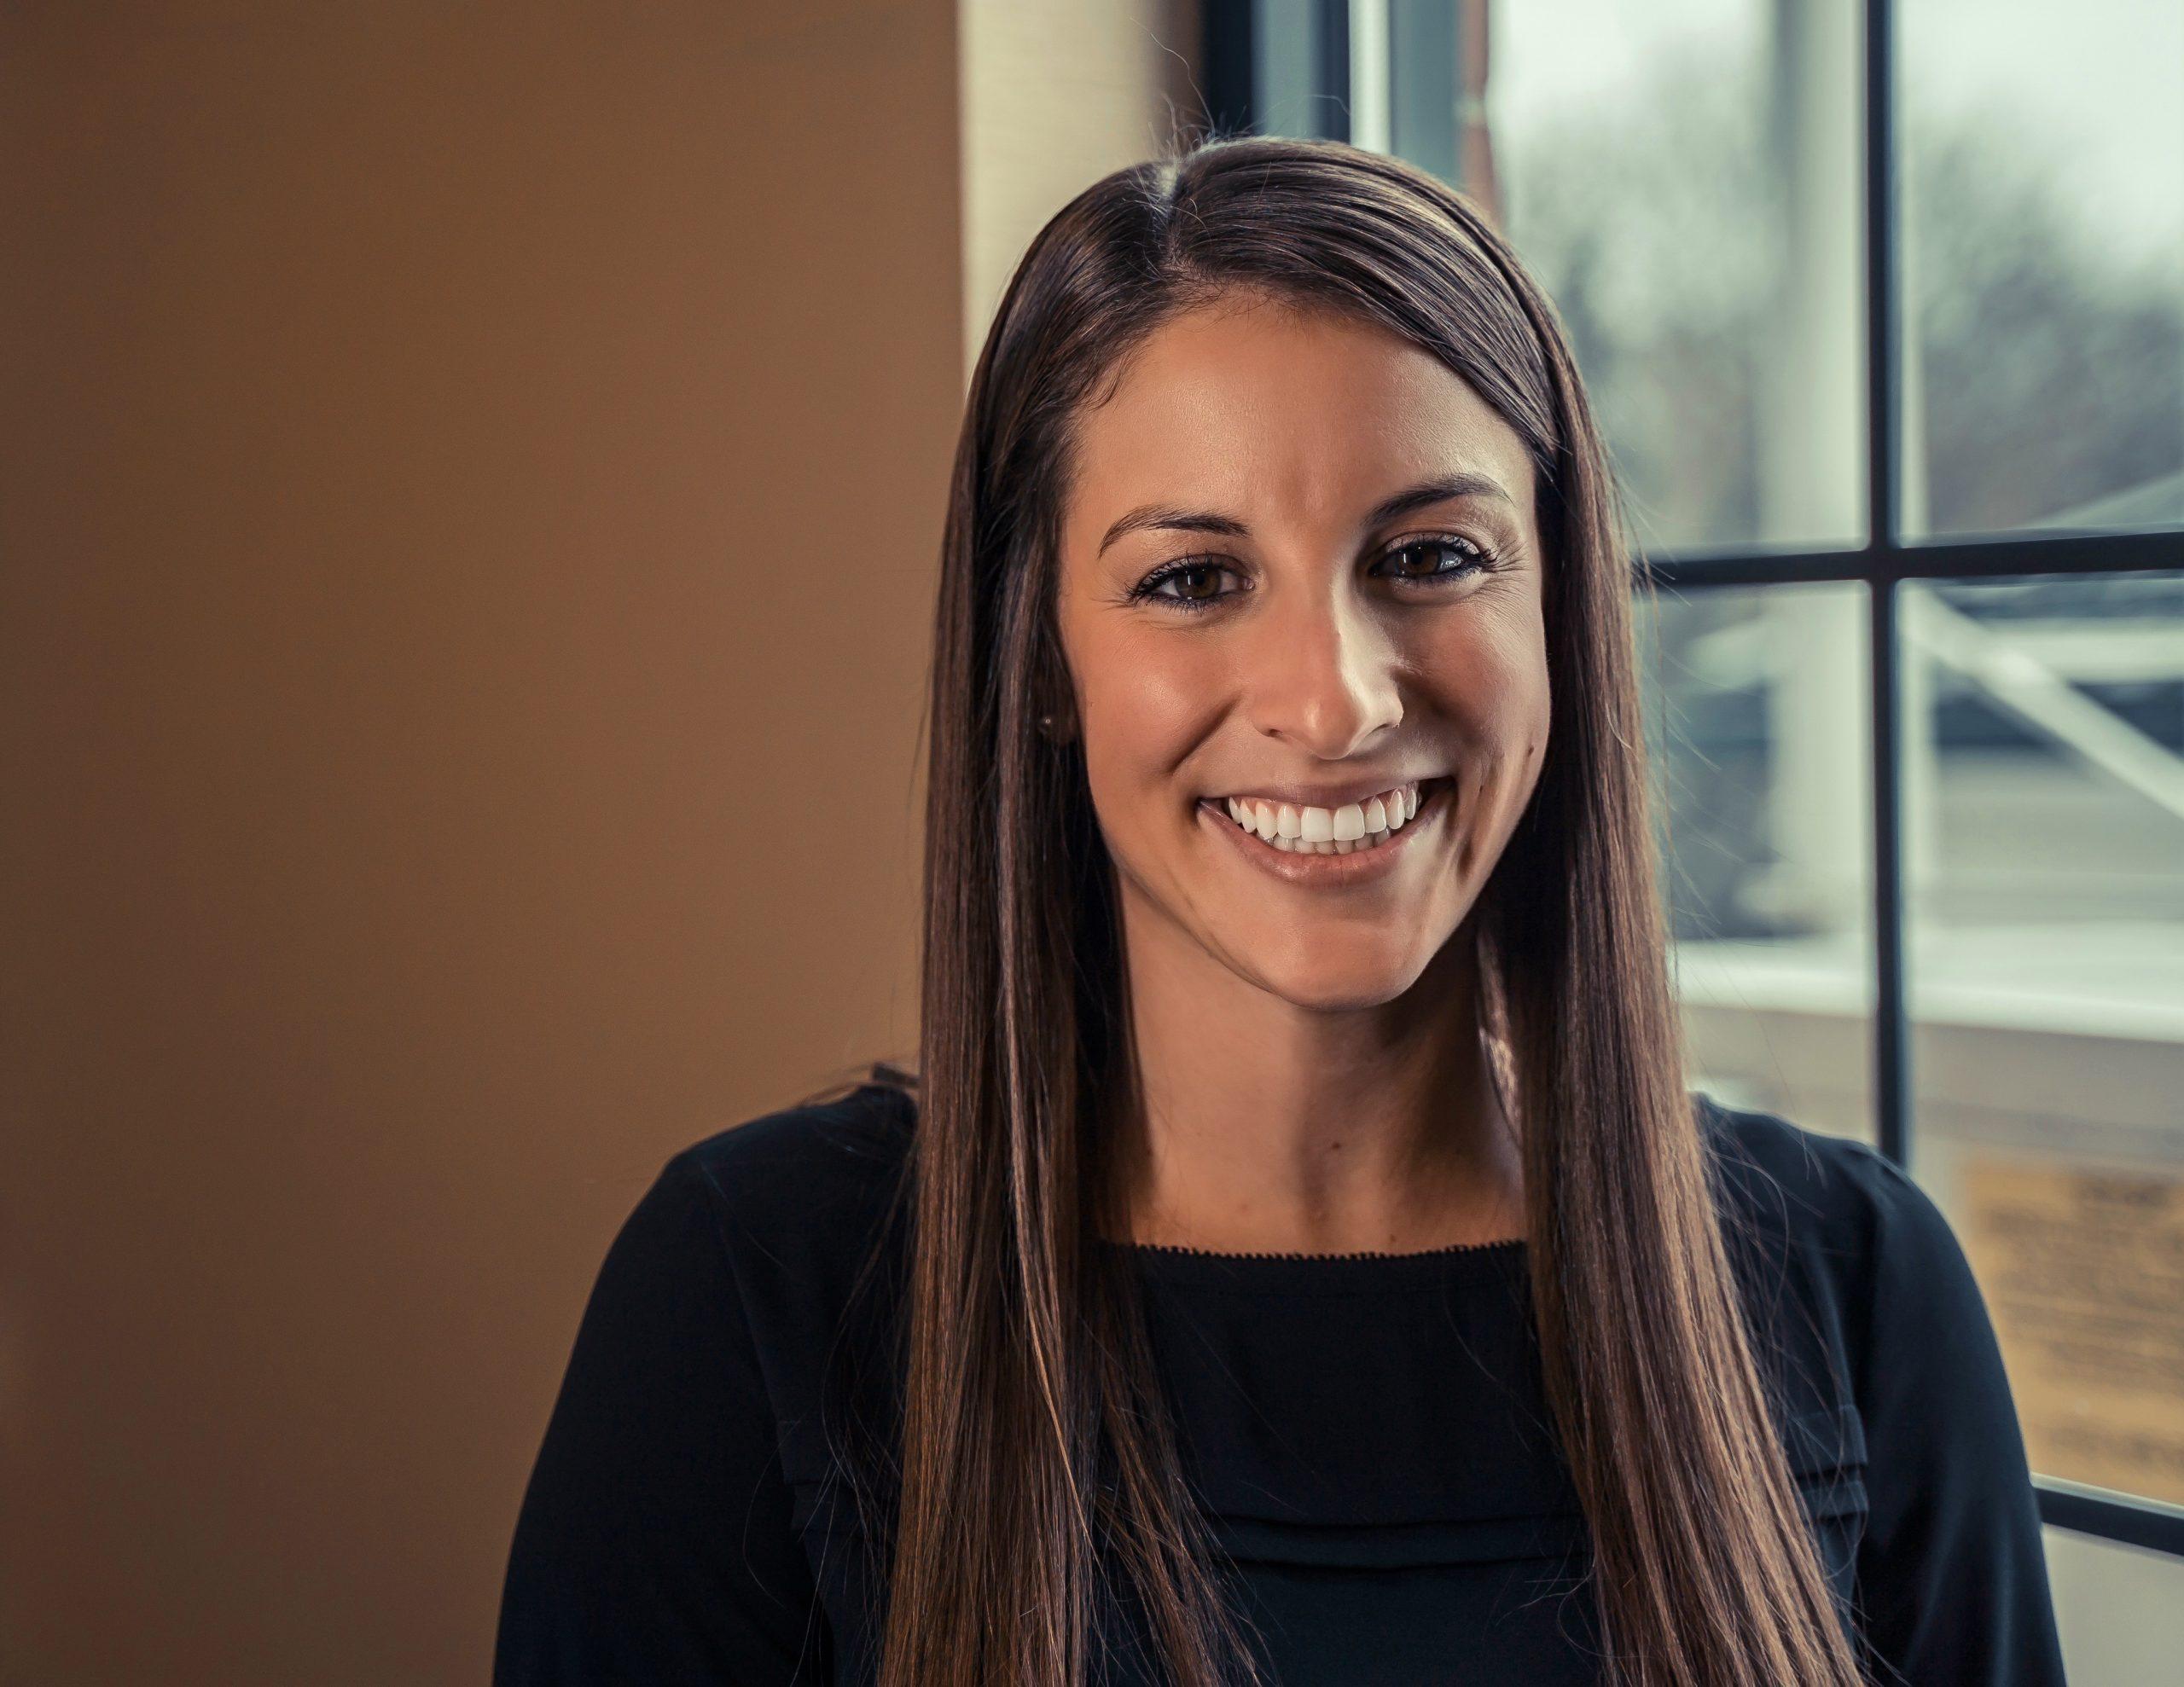 Megan Sage Mortgage Broker - Not Adults Video